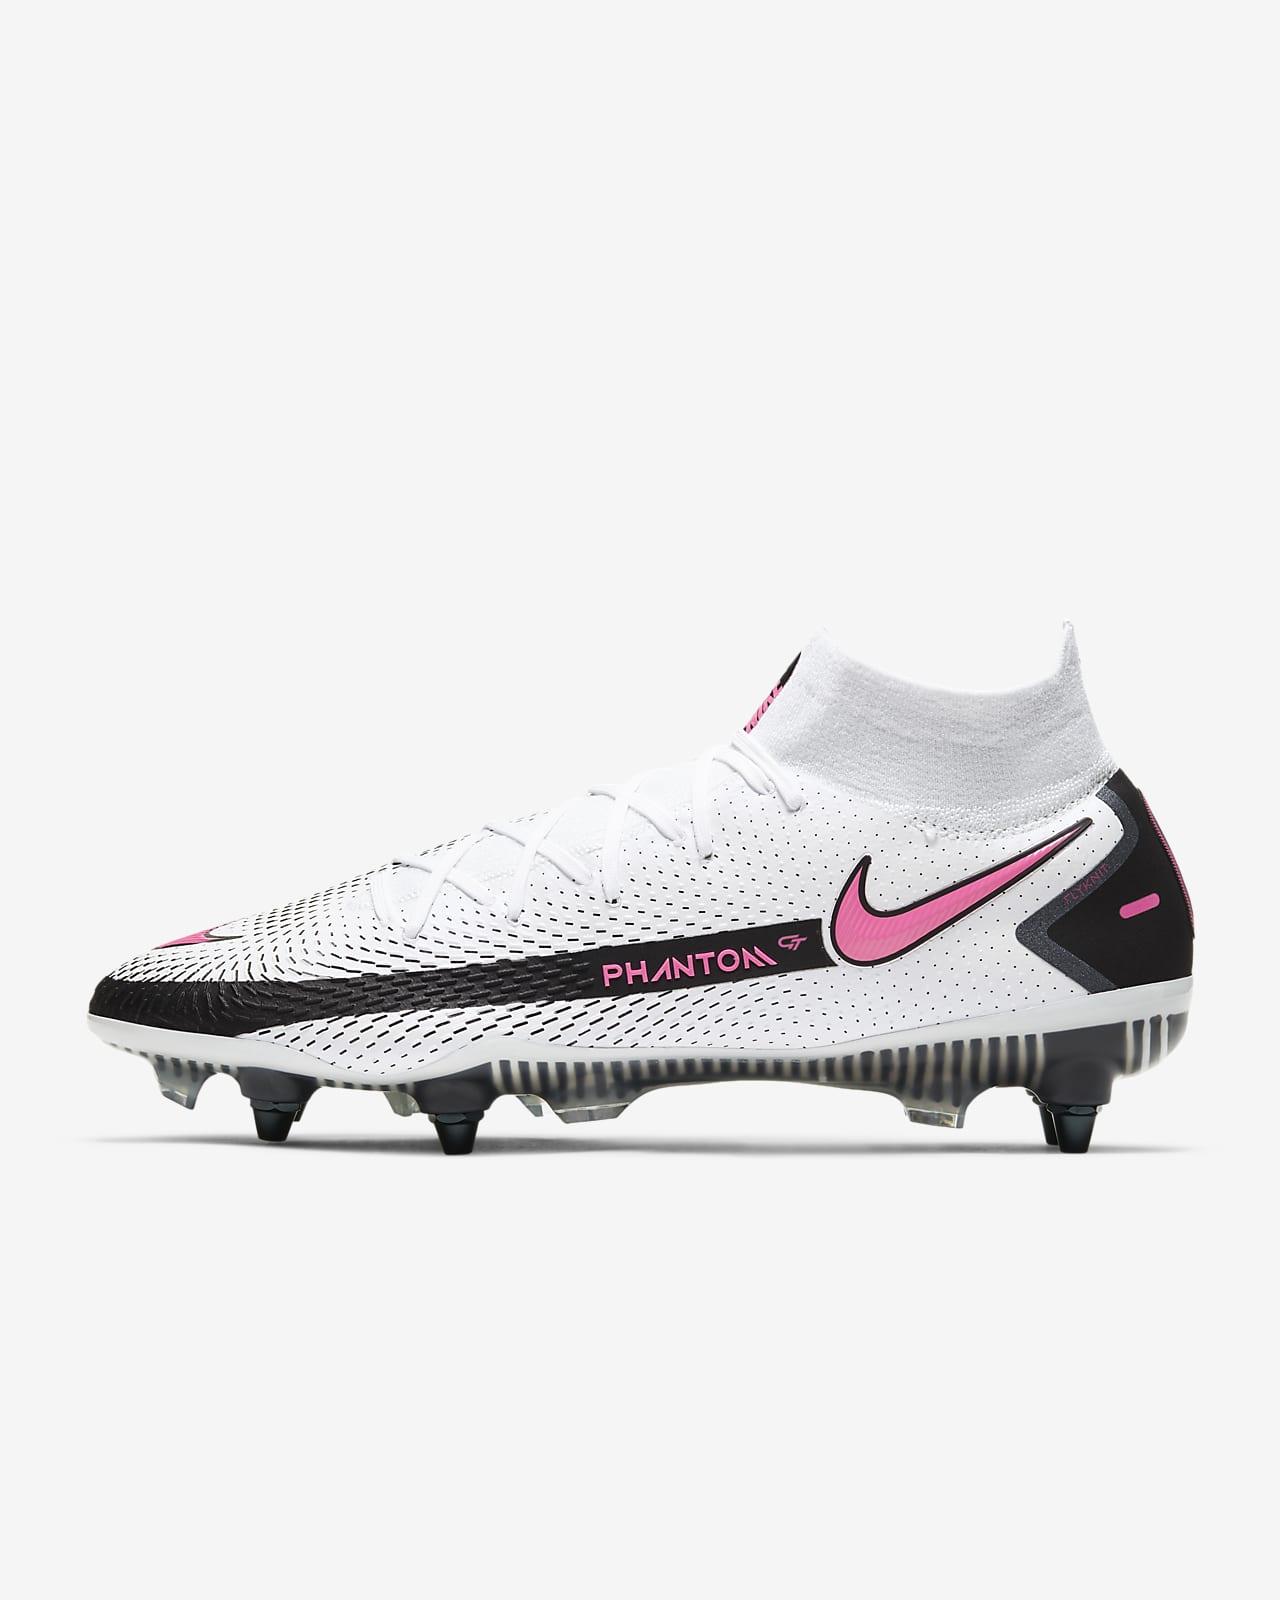 Nike Phantom GT Elite Dynamic Fit SG-Pro AC Soft-Ground Football Boot